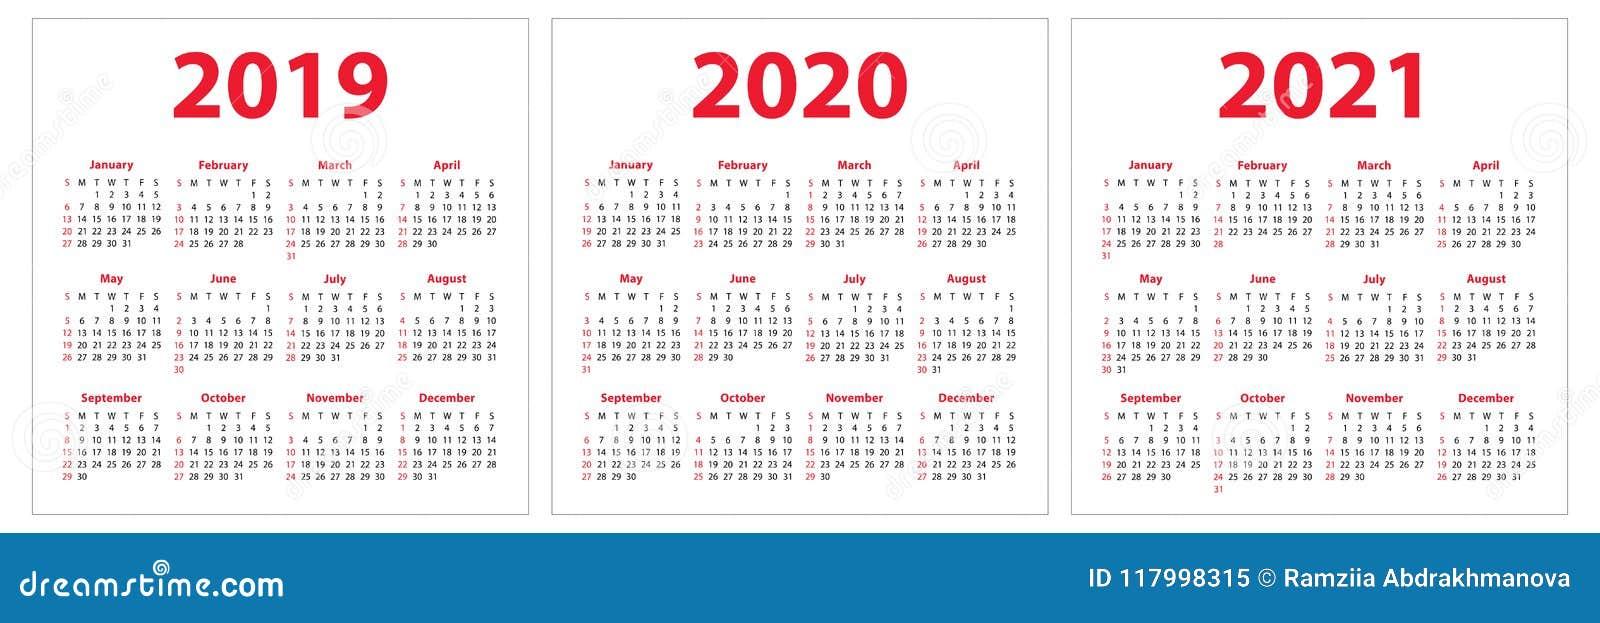 Calendar With Week Numbers 2020.Calendar 2019 2020 2021 Years Colorful Set Week Starts On Sunday